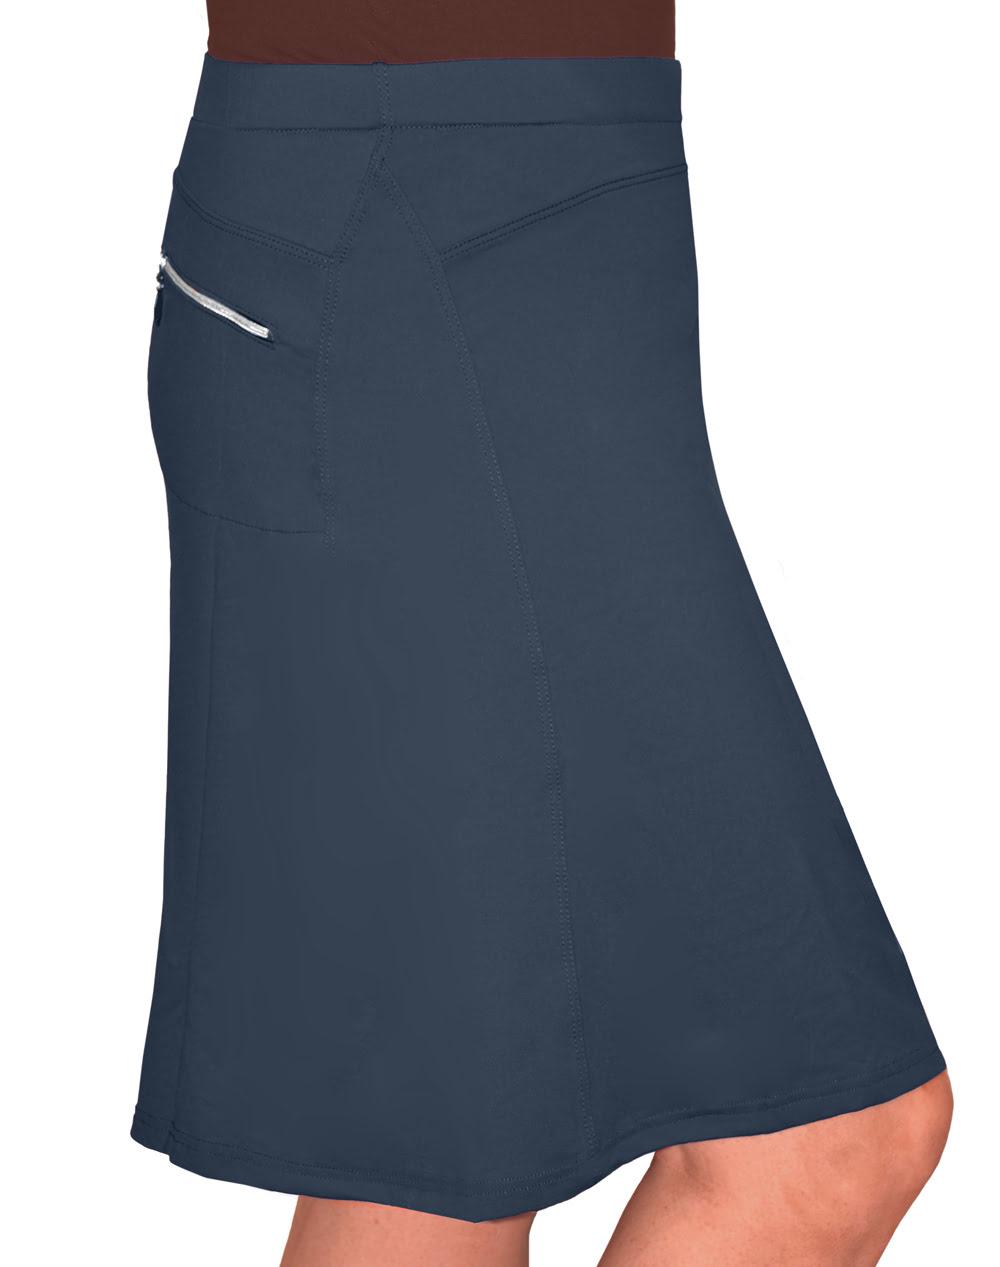 kosher casual s to the knee length running skirt